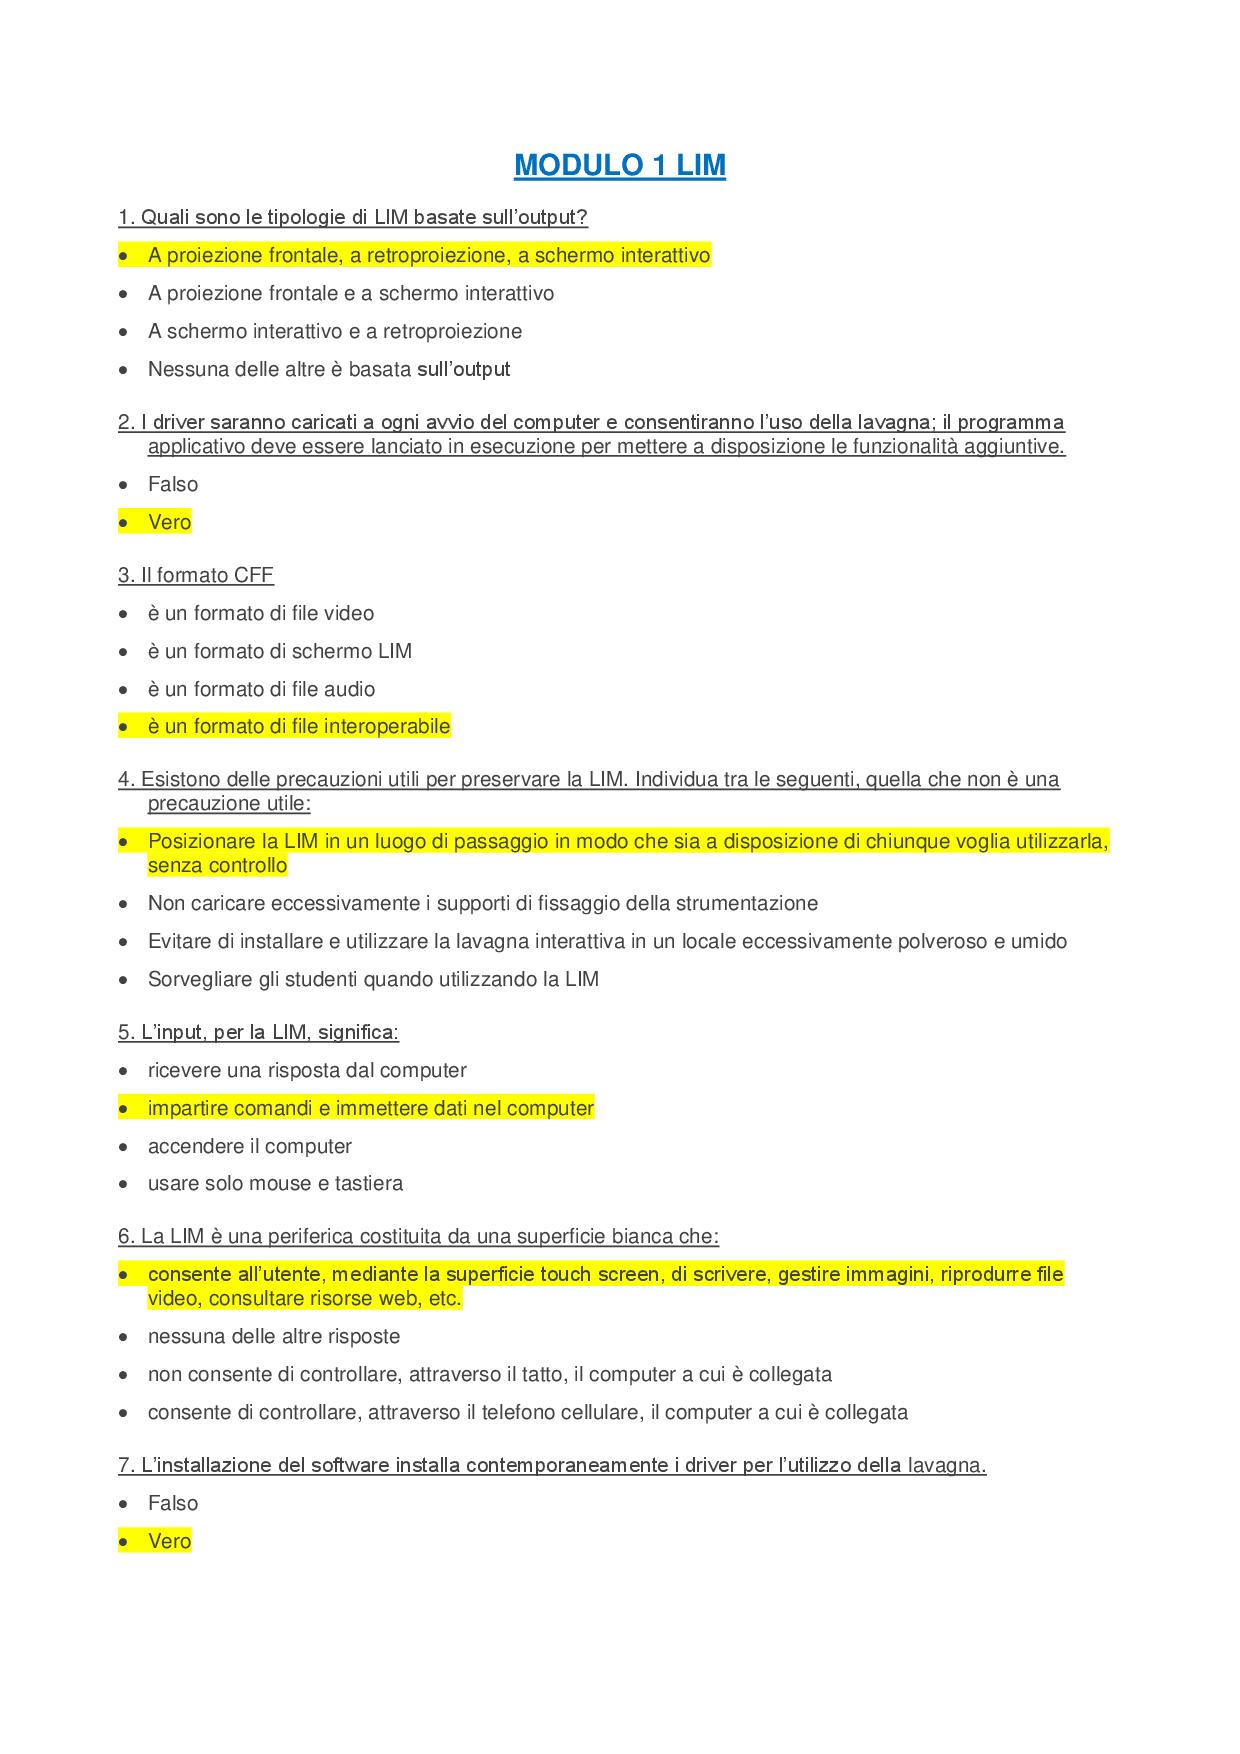 Modulo 1 Lim Eipass Soluzioni Esame - Docsity tout Docsity